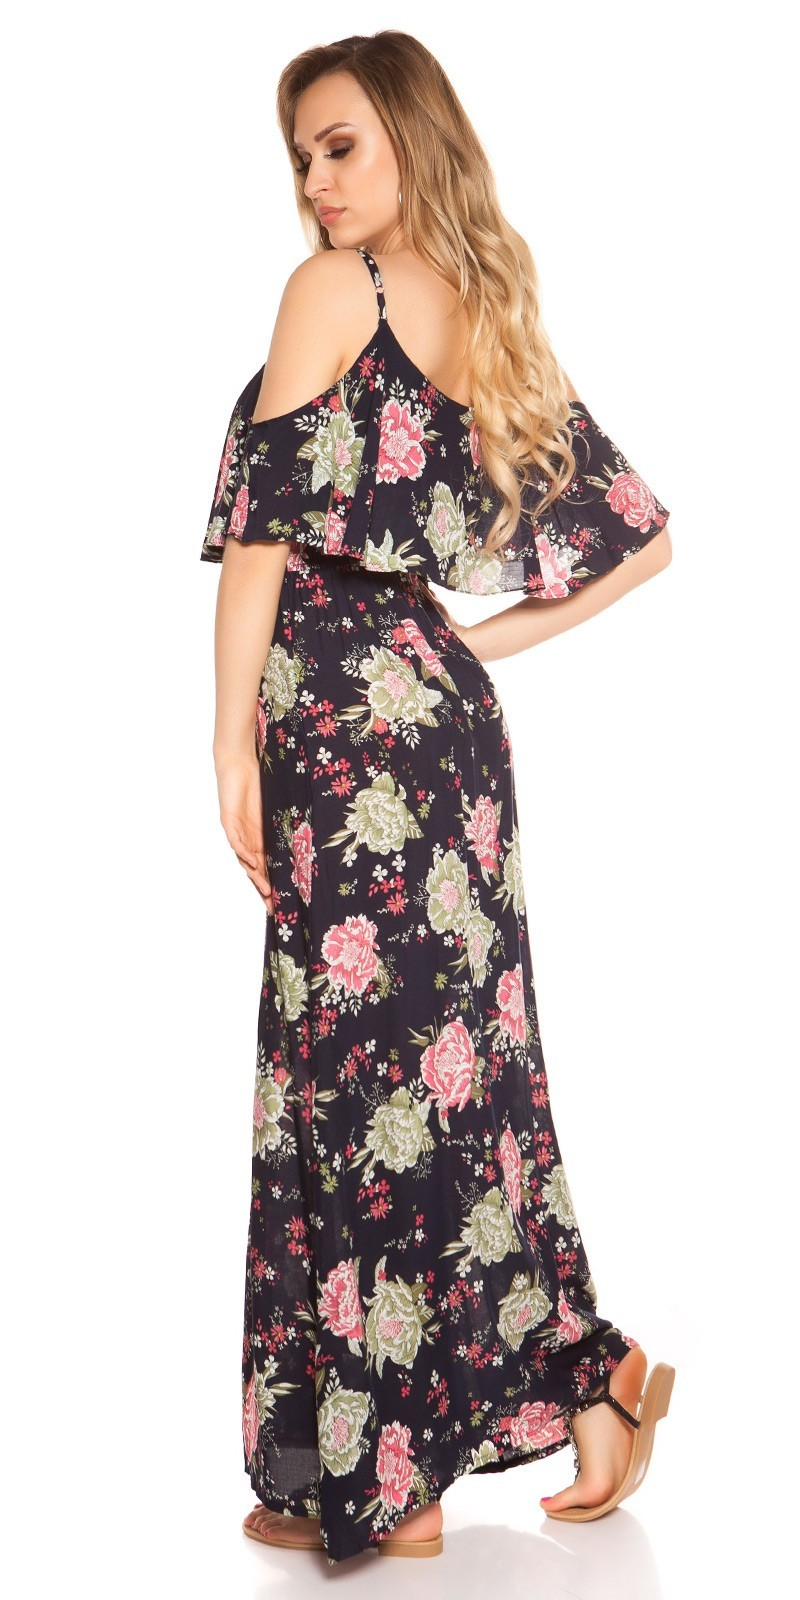 Letné šaty – Stránka 27 – Sissy Boutique 6ffc4429c8a